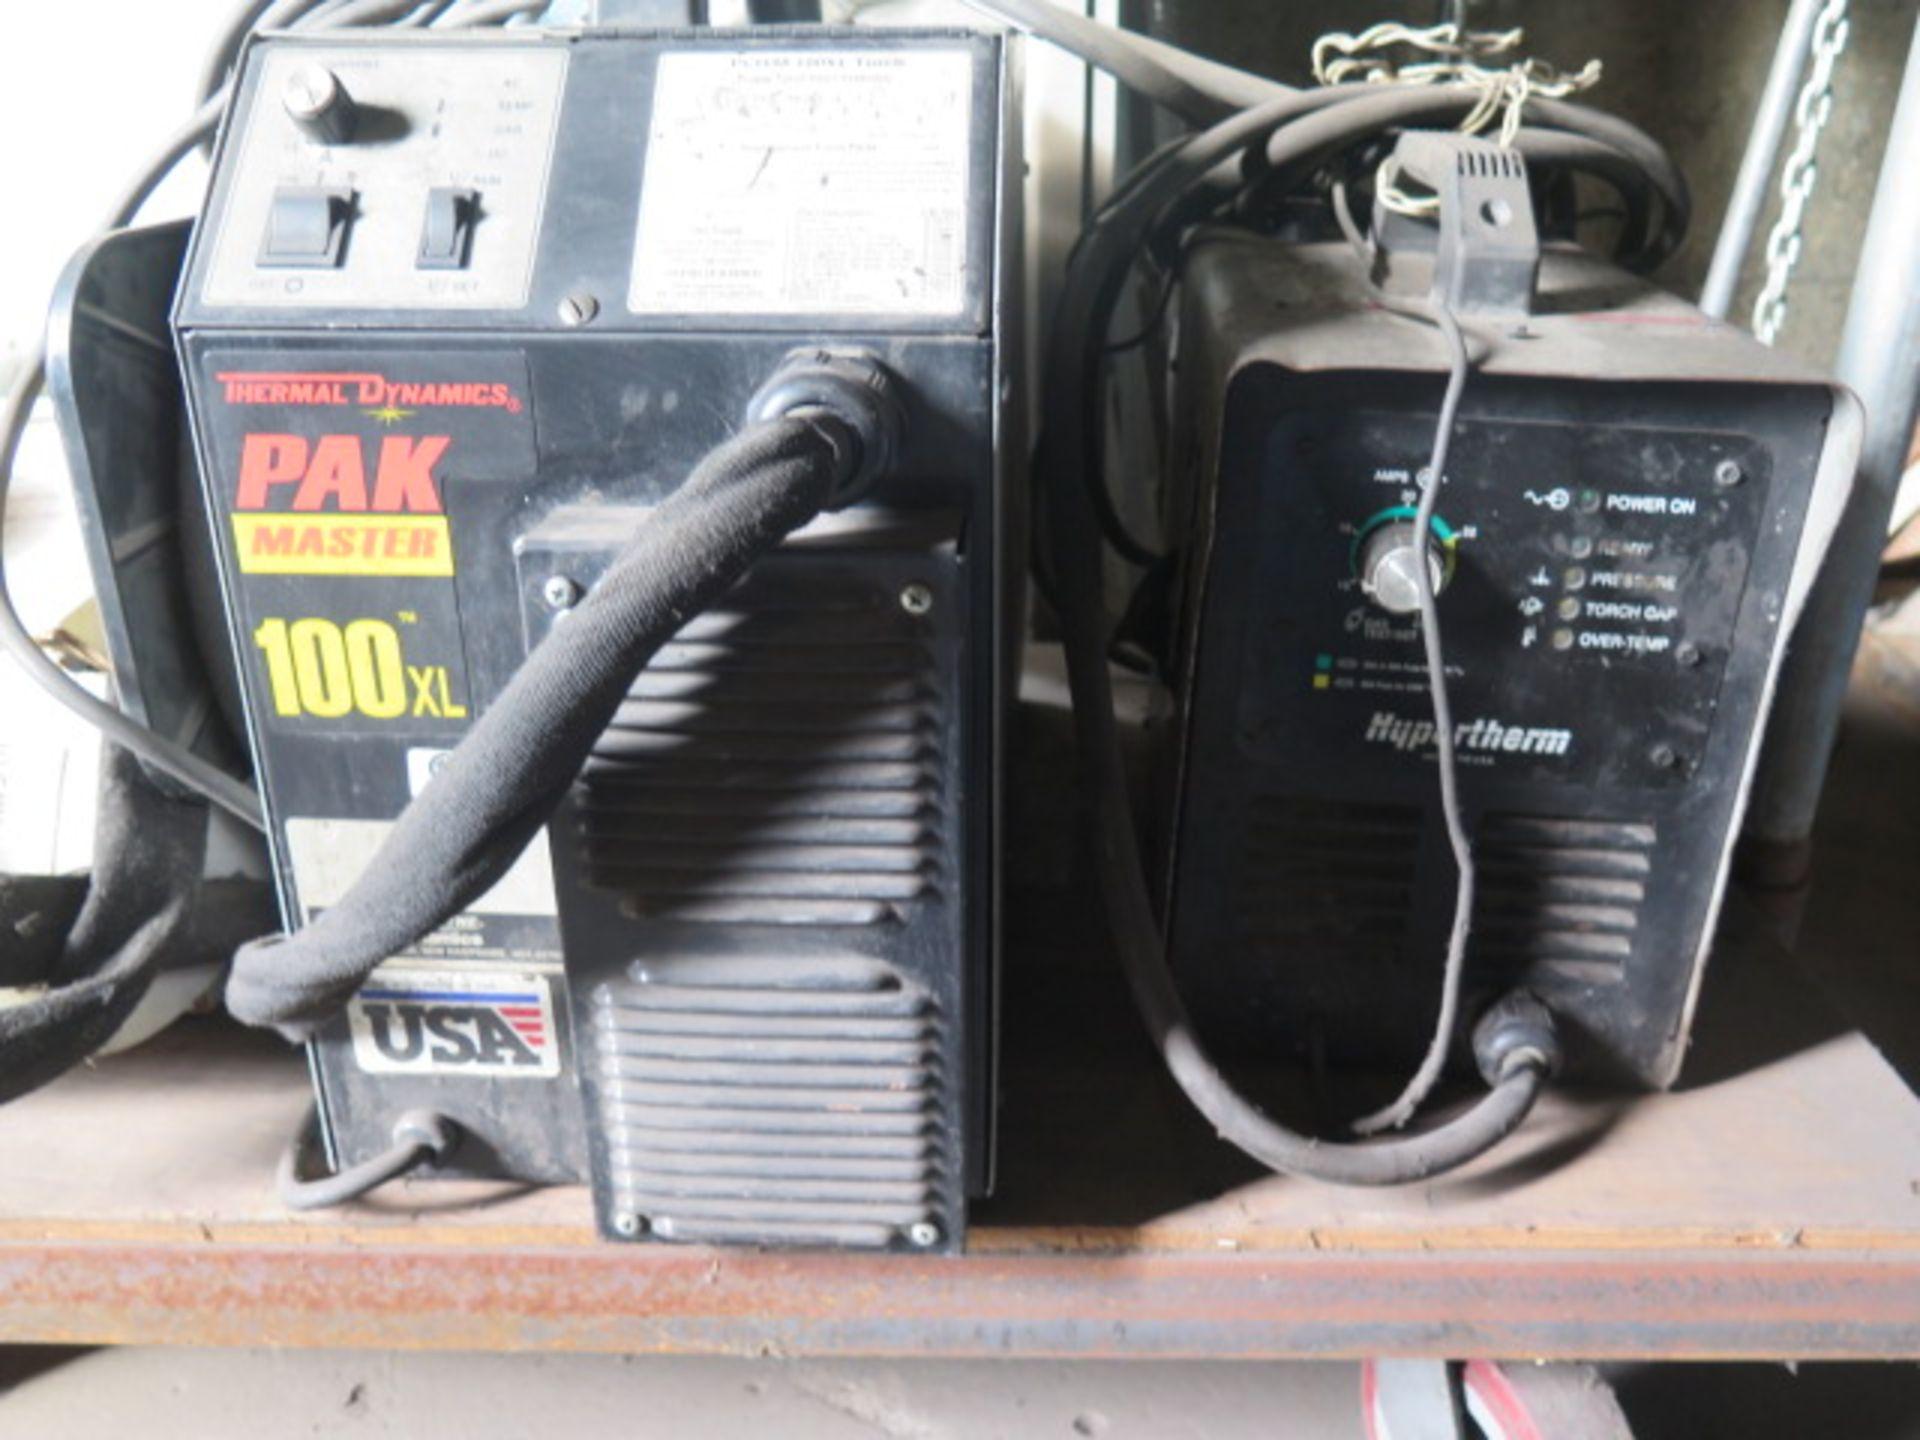 Lot 211 - Thermal Dynamics PAKmaster100XL and Hypertherm Powermax 350 Plasma Cutting Power Sources (2)